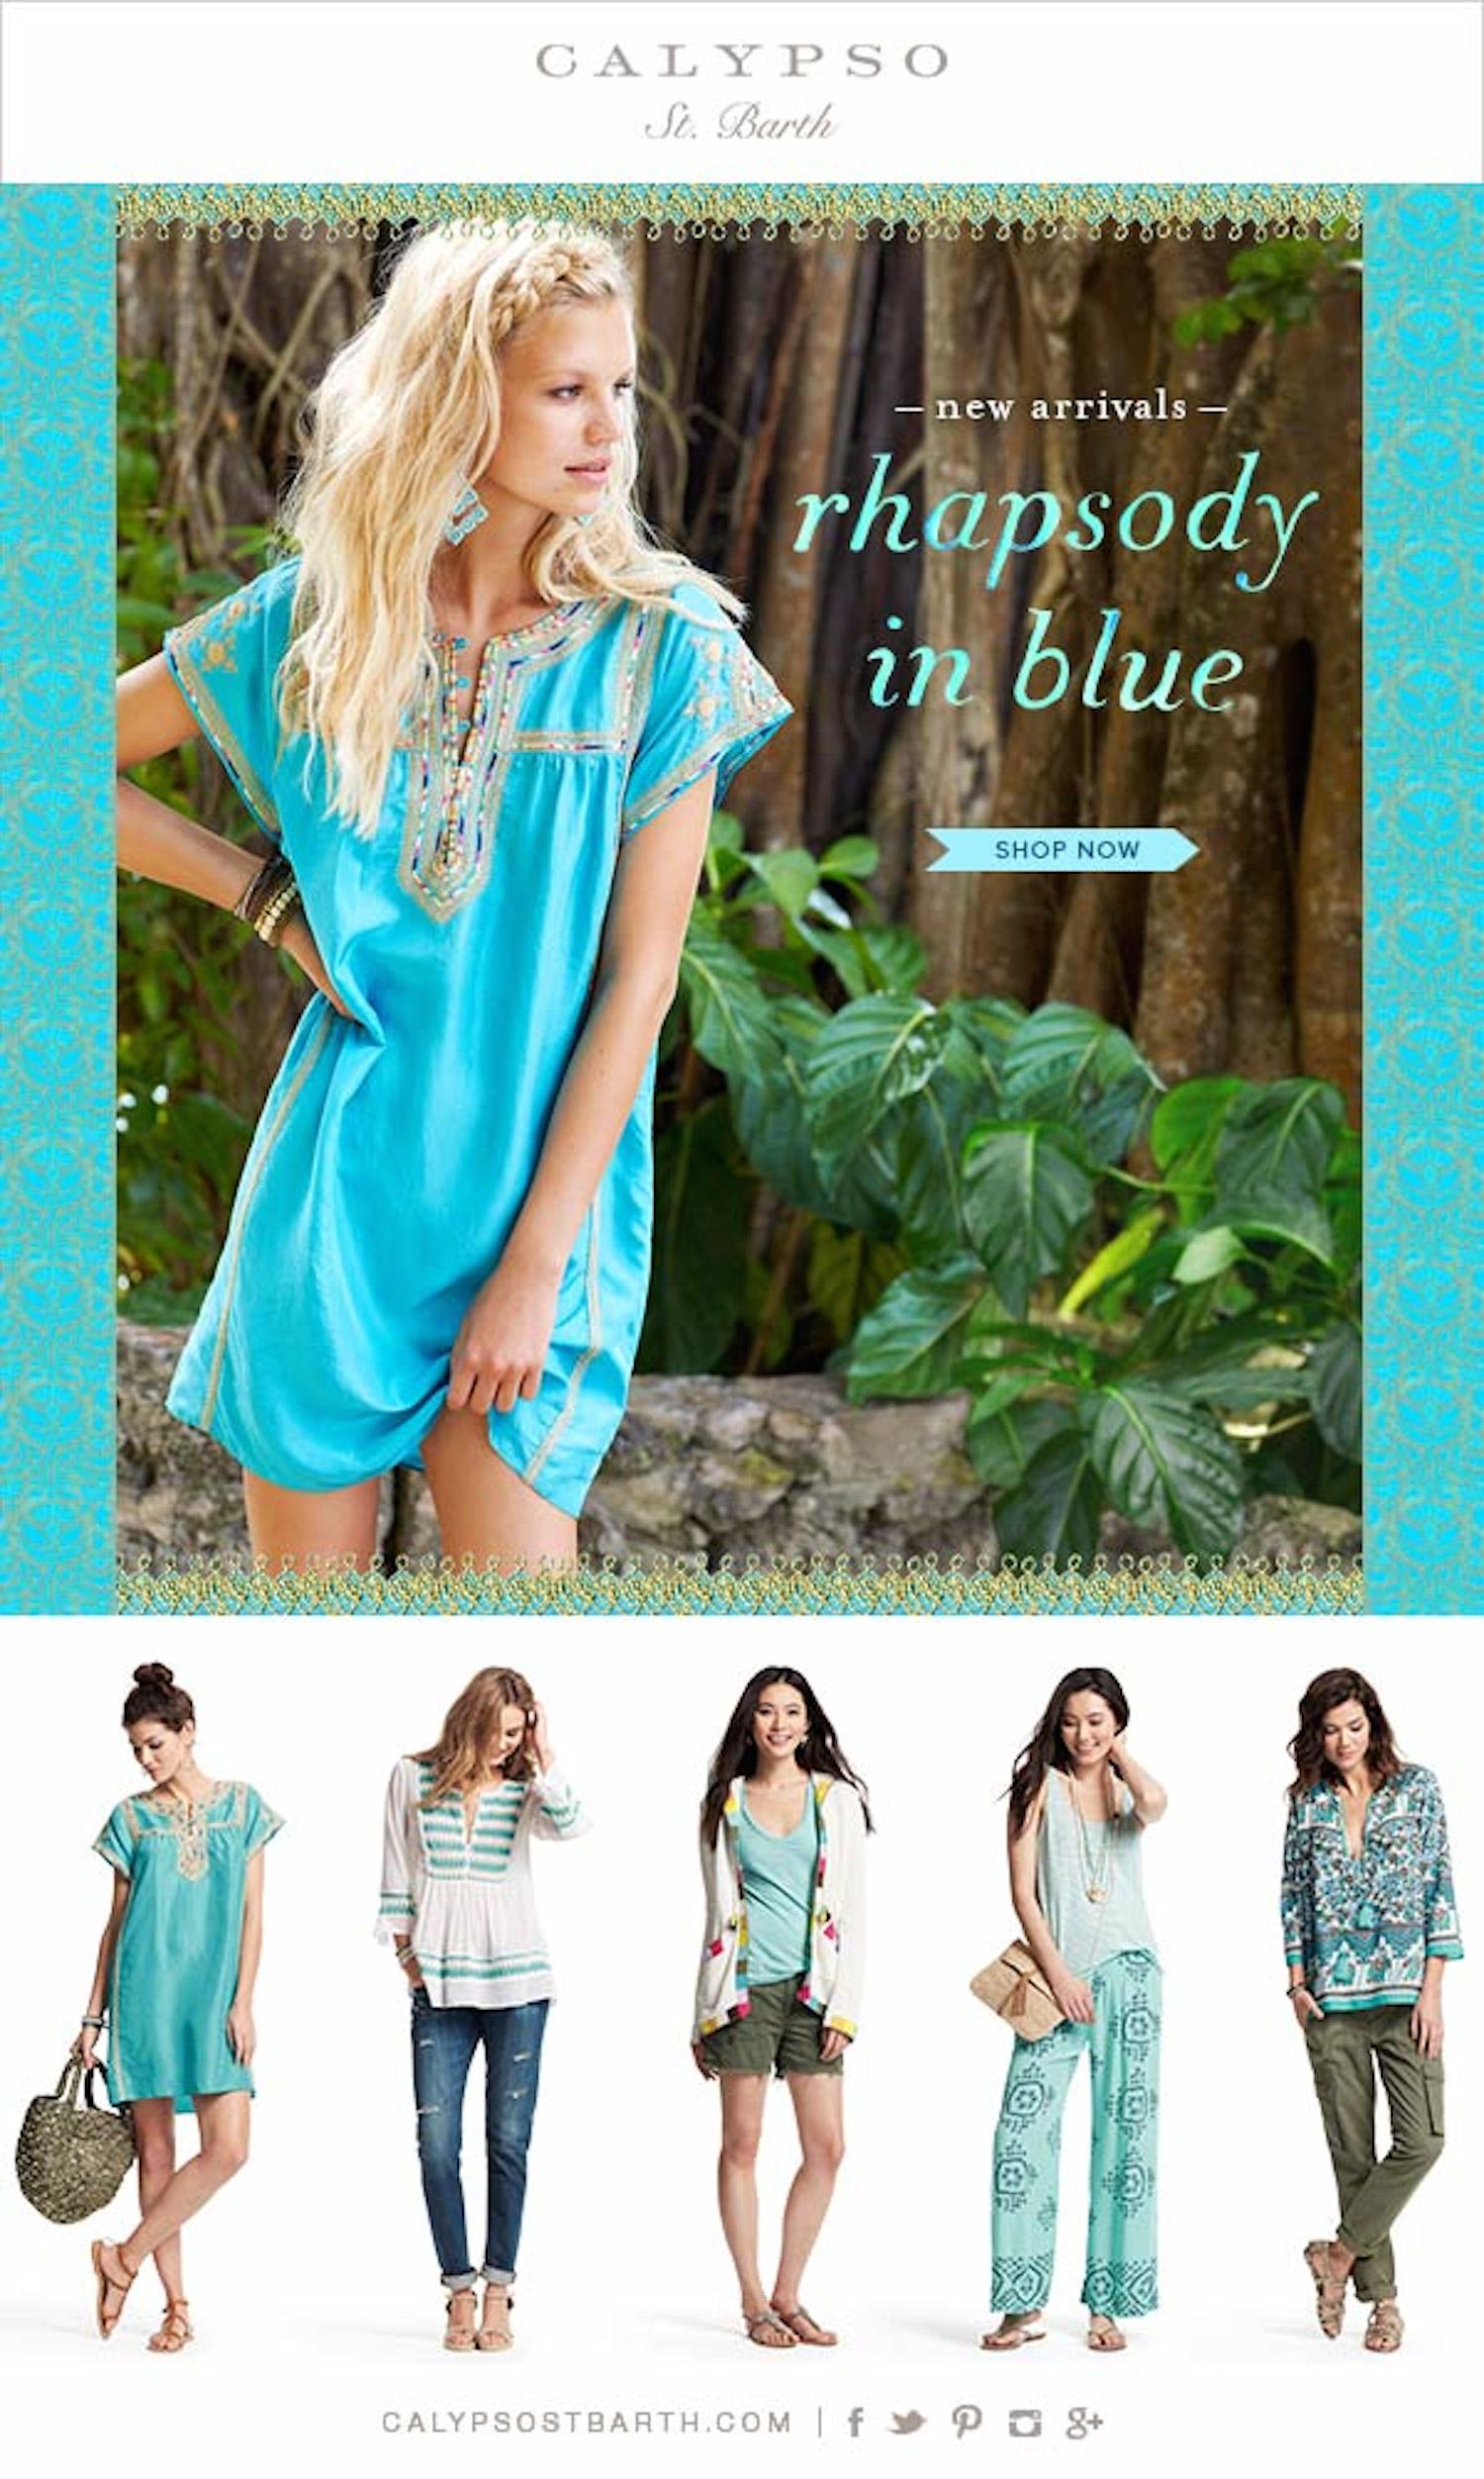 rhapsody in blue calypso st barth in barbados with nadine leopold and matt jones